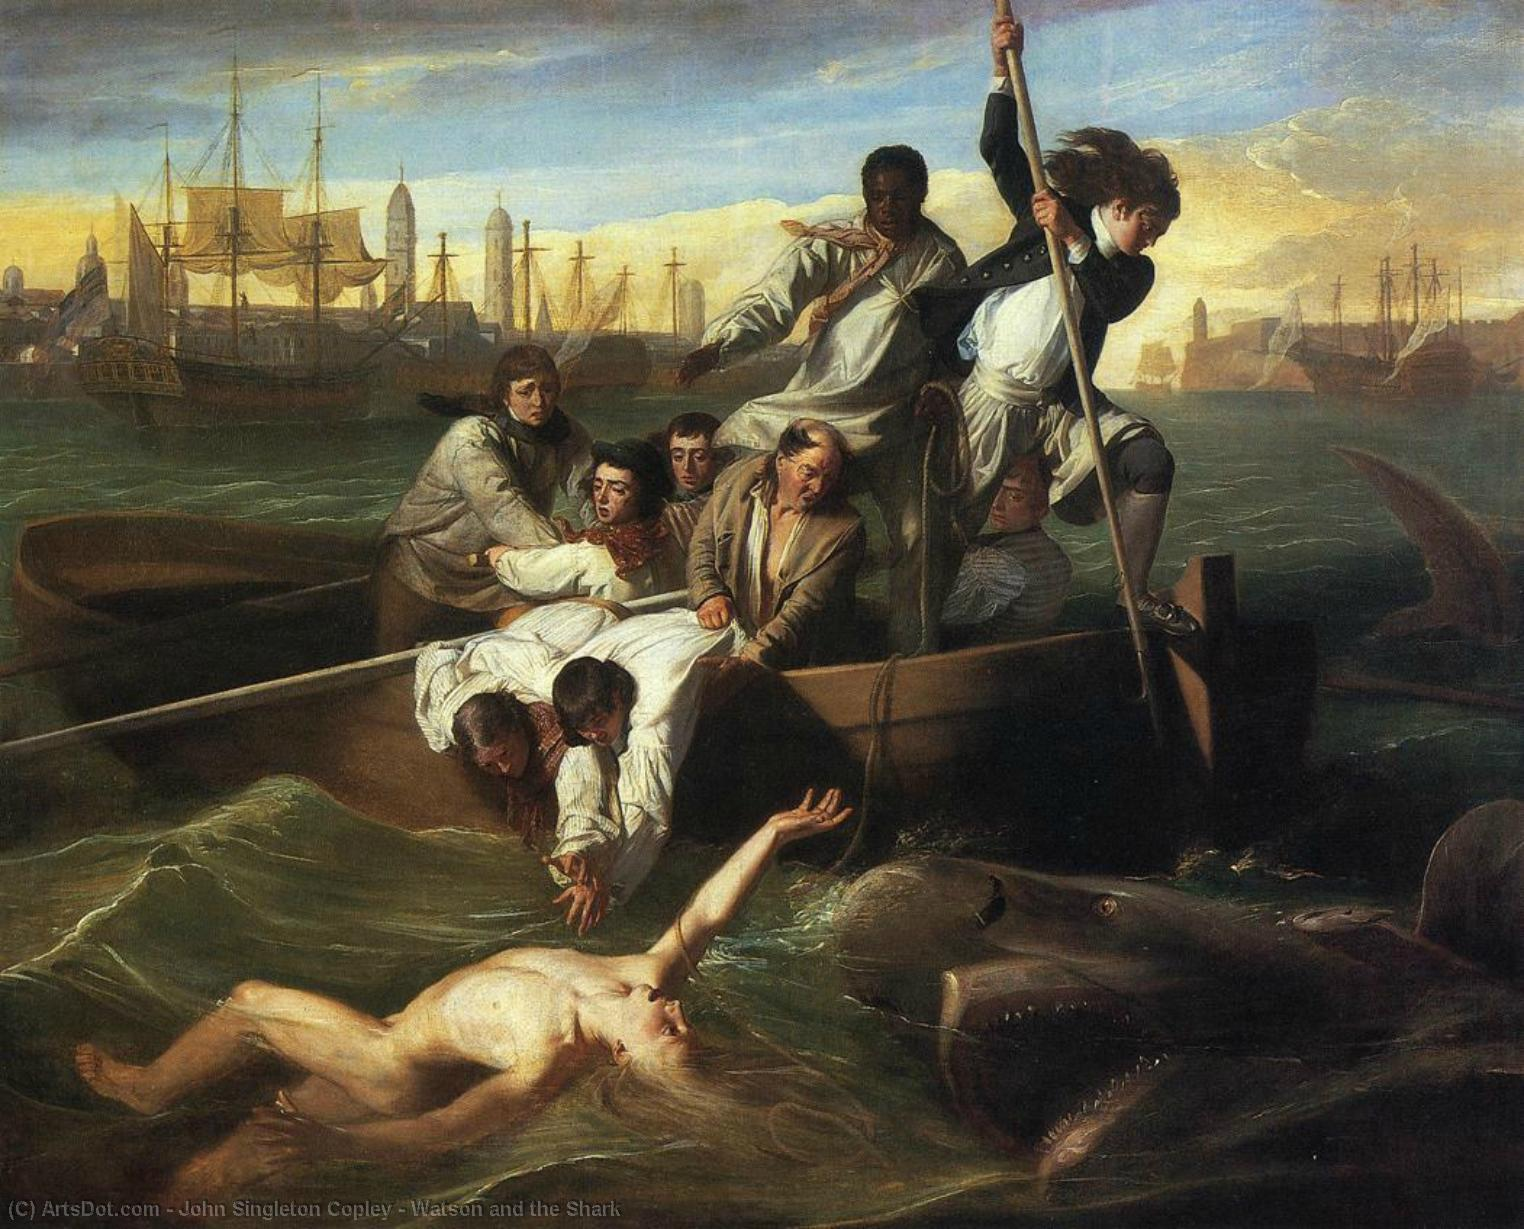 Wikioo.org - The Encyclopedia of Fine Arts - Painting, Artwork by John Singleton Copley - Watson and the Shark